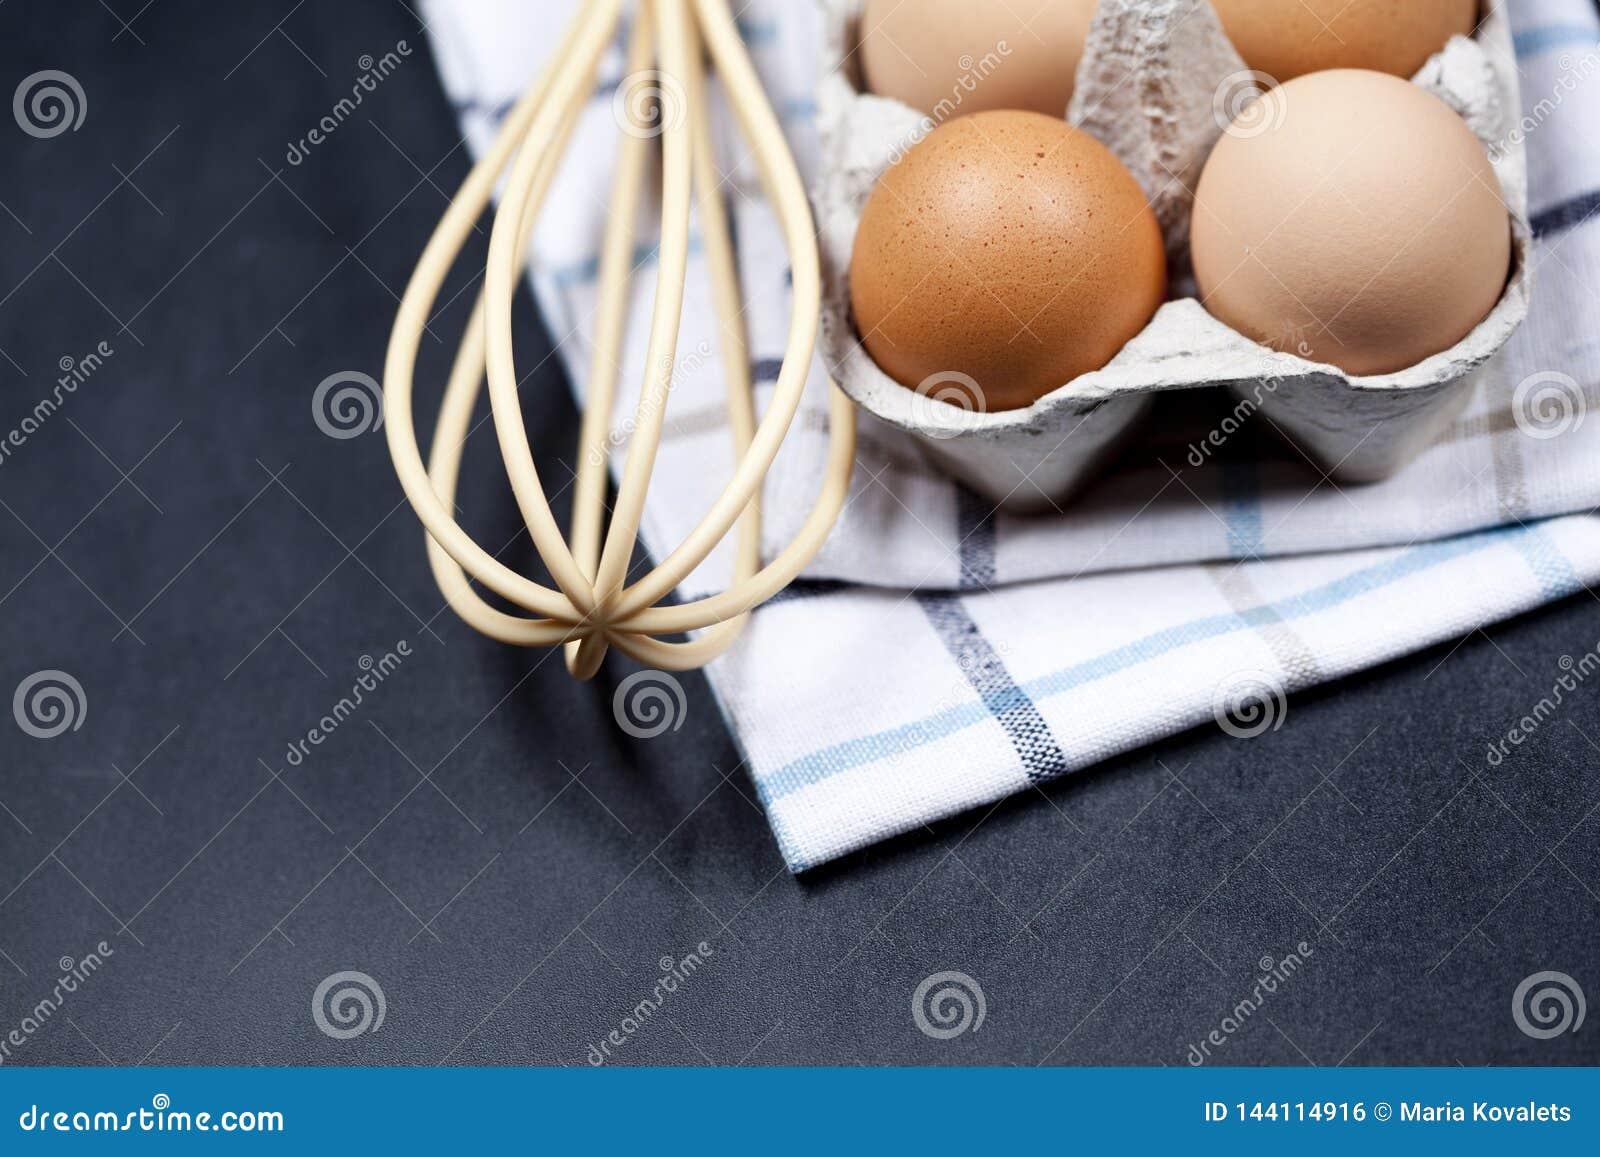 Eggs in cardboard box, towel and whisker closeup on backboard background